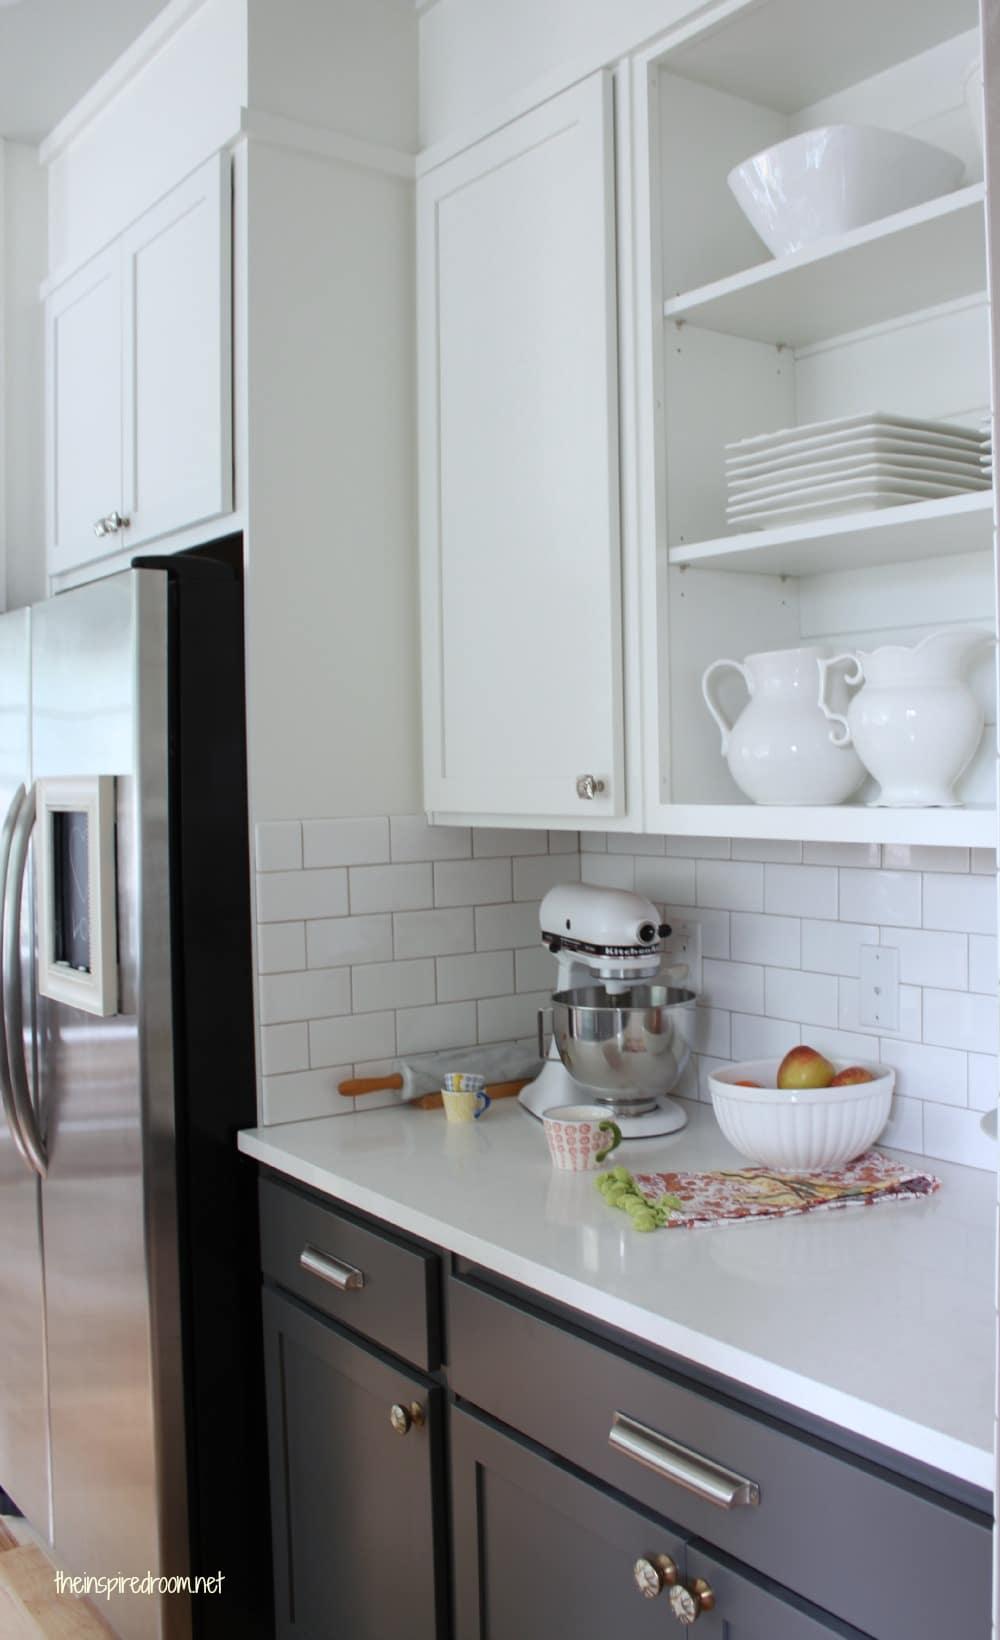 kitchen cabinet colors kitchen cabinets white dove white upper cabinet colors